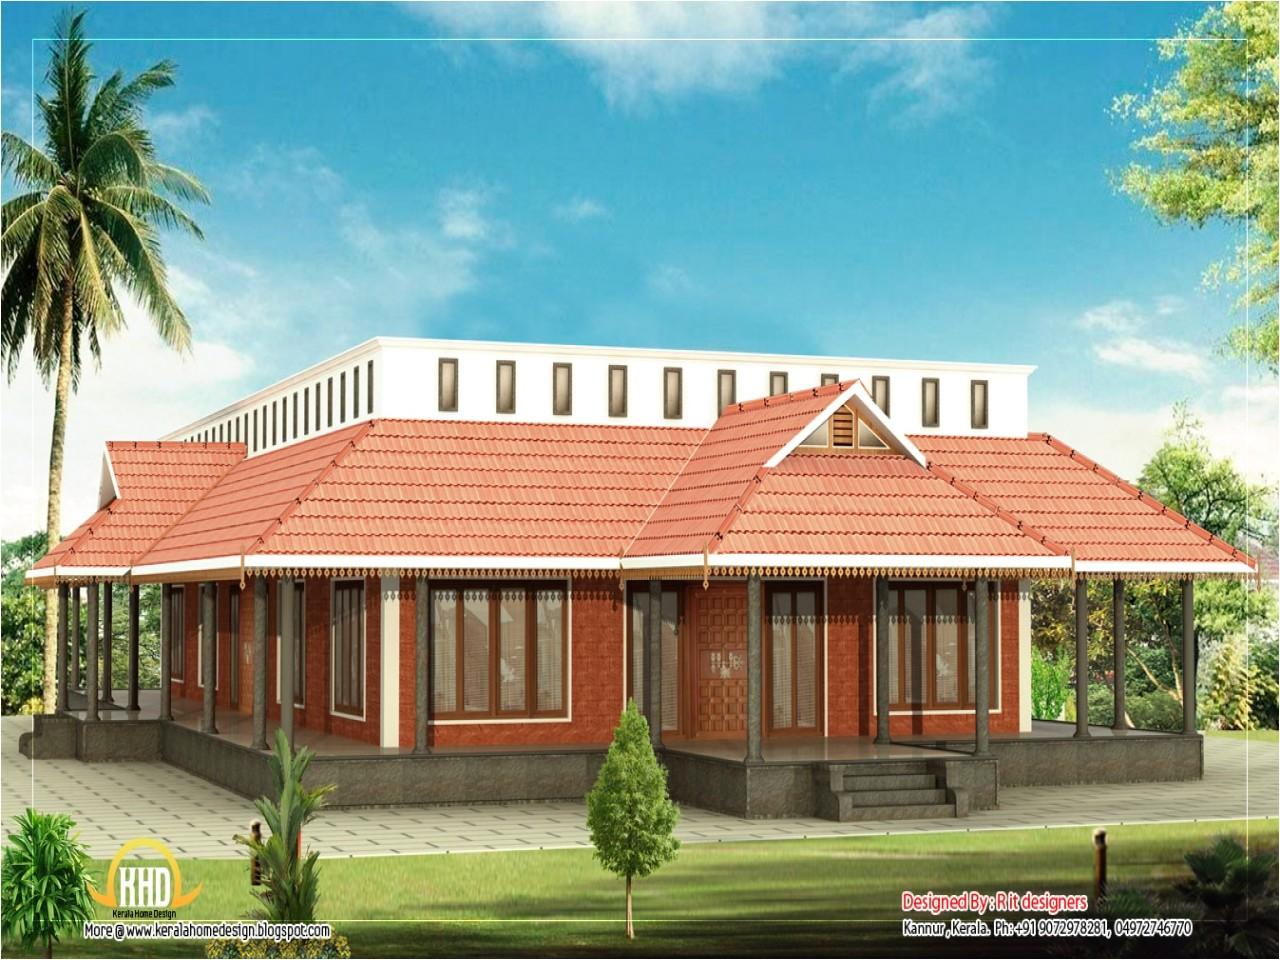 0255e64ab83c6b6e cabbage thoran kerala style kerala style single floor house plan